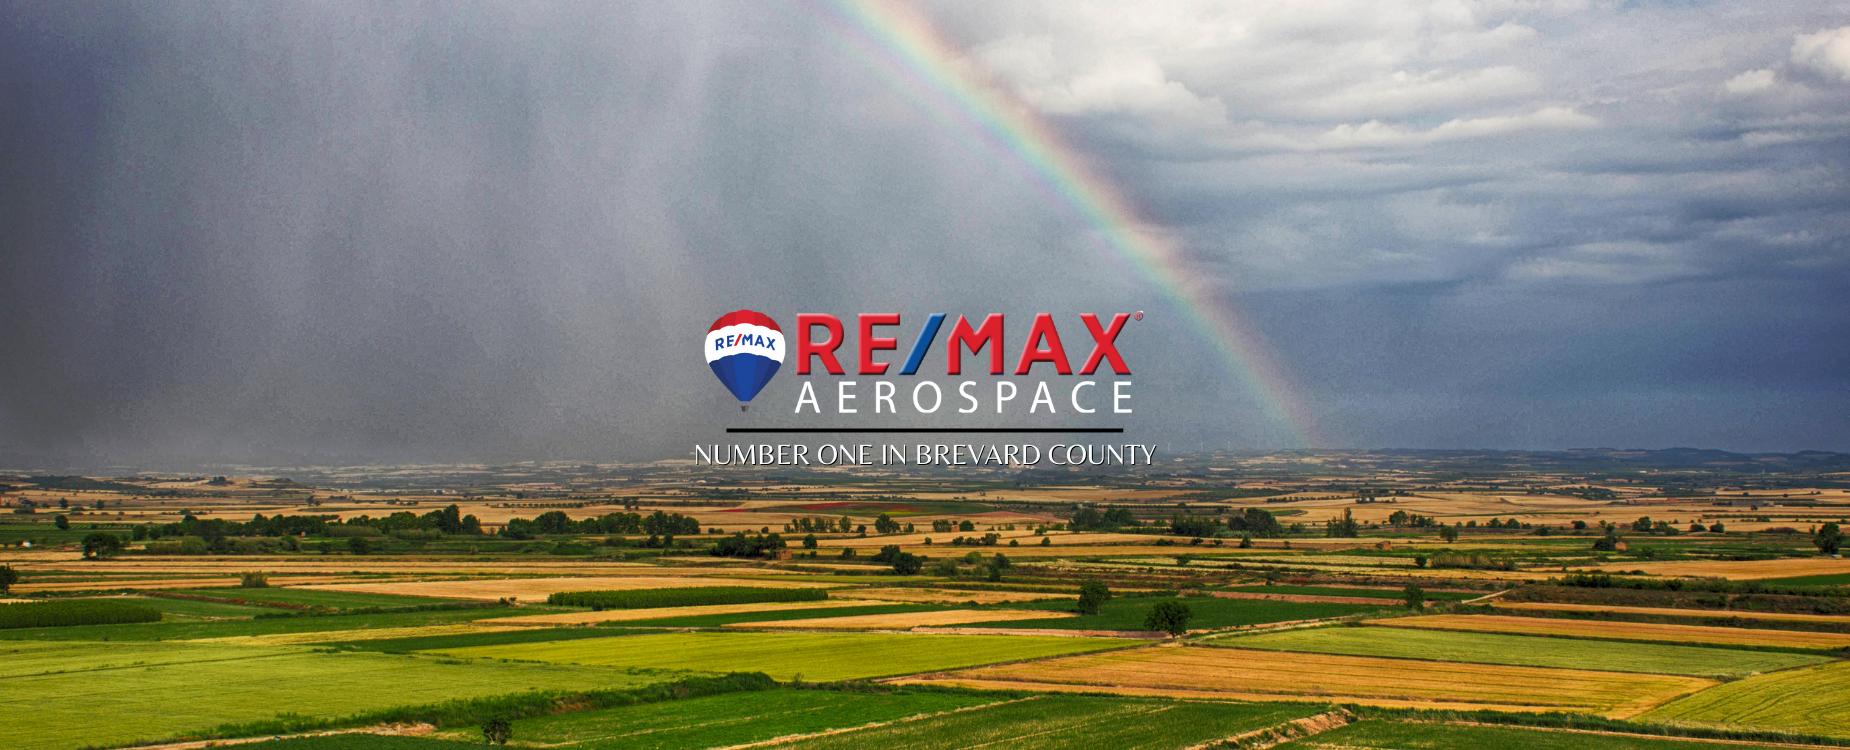 Remax Aerospace - rainbow